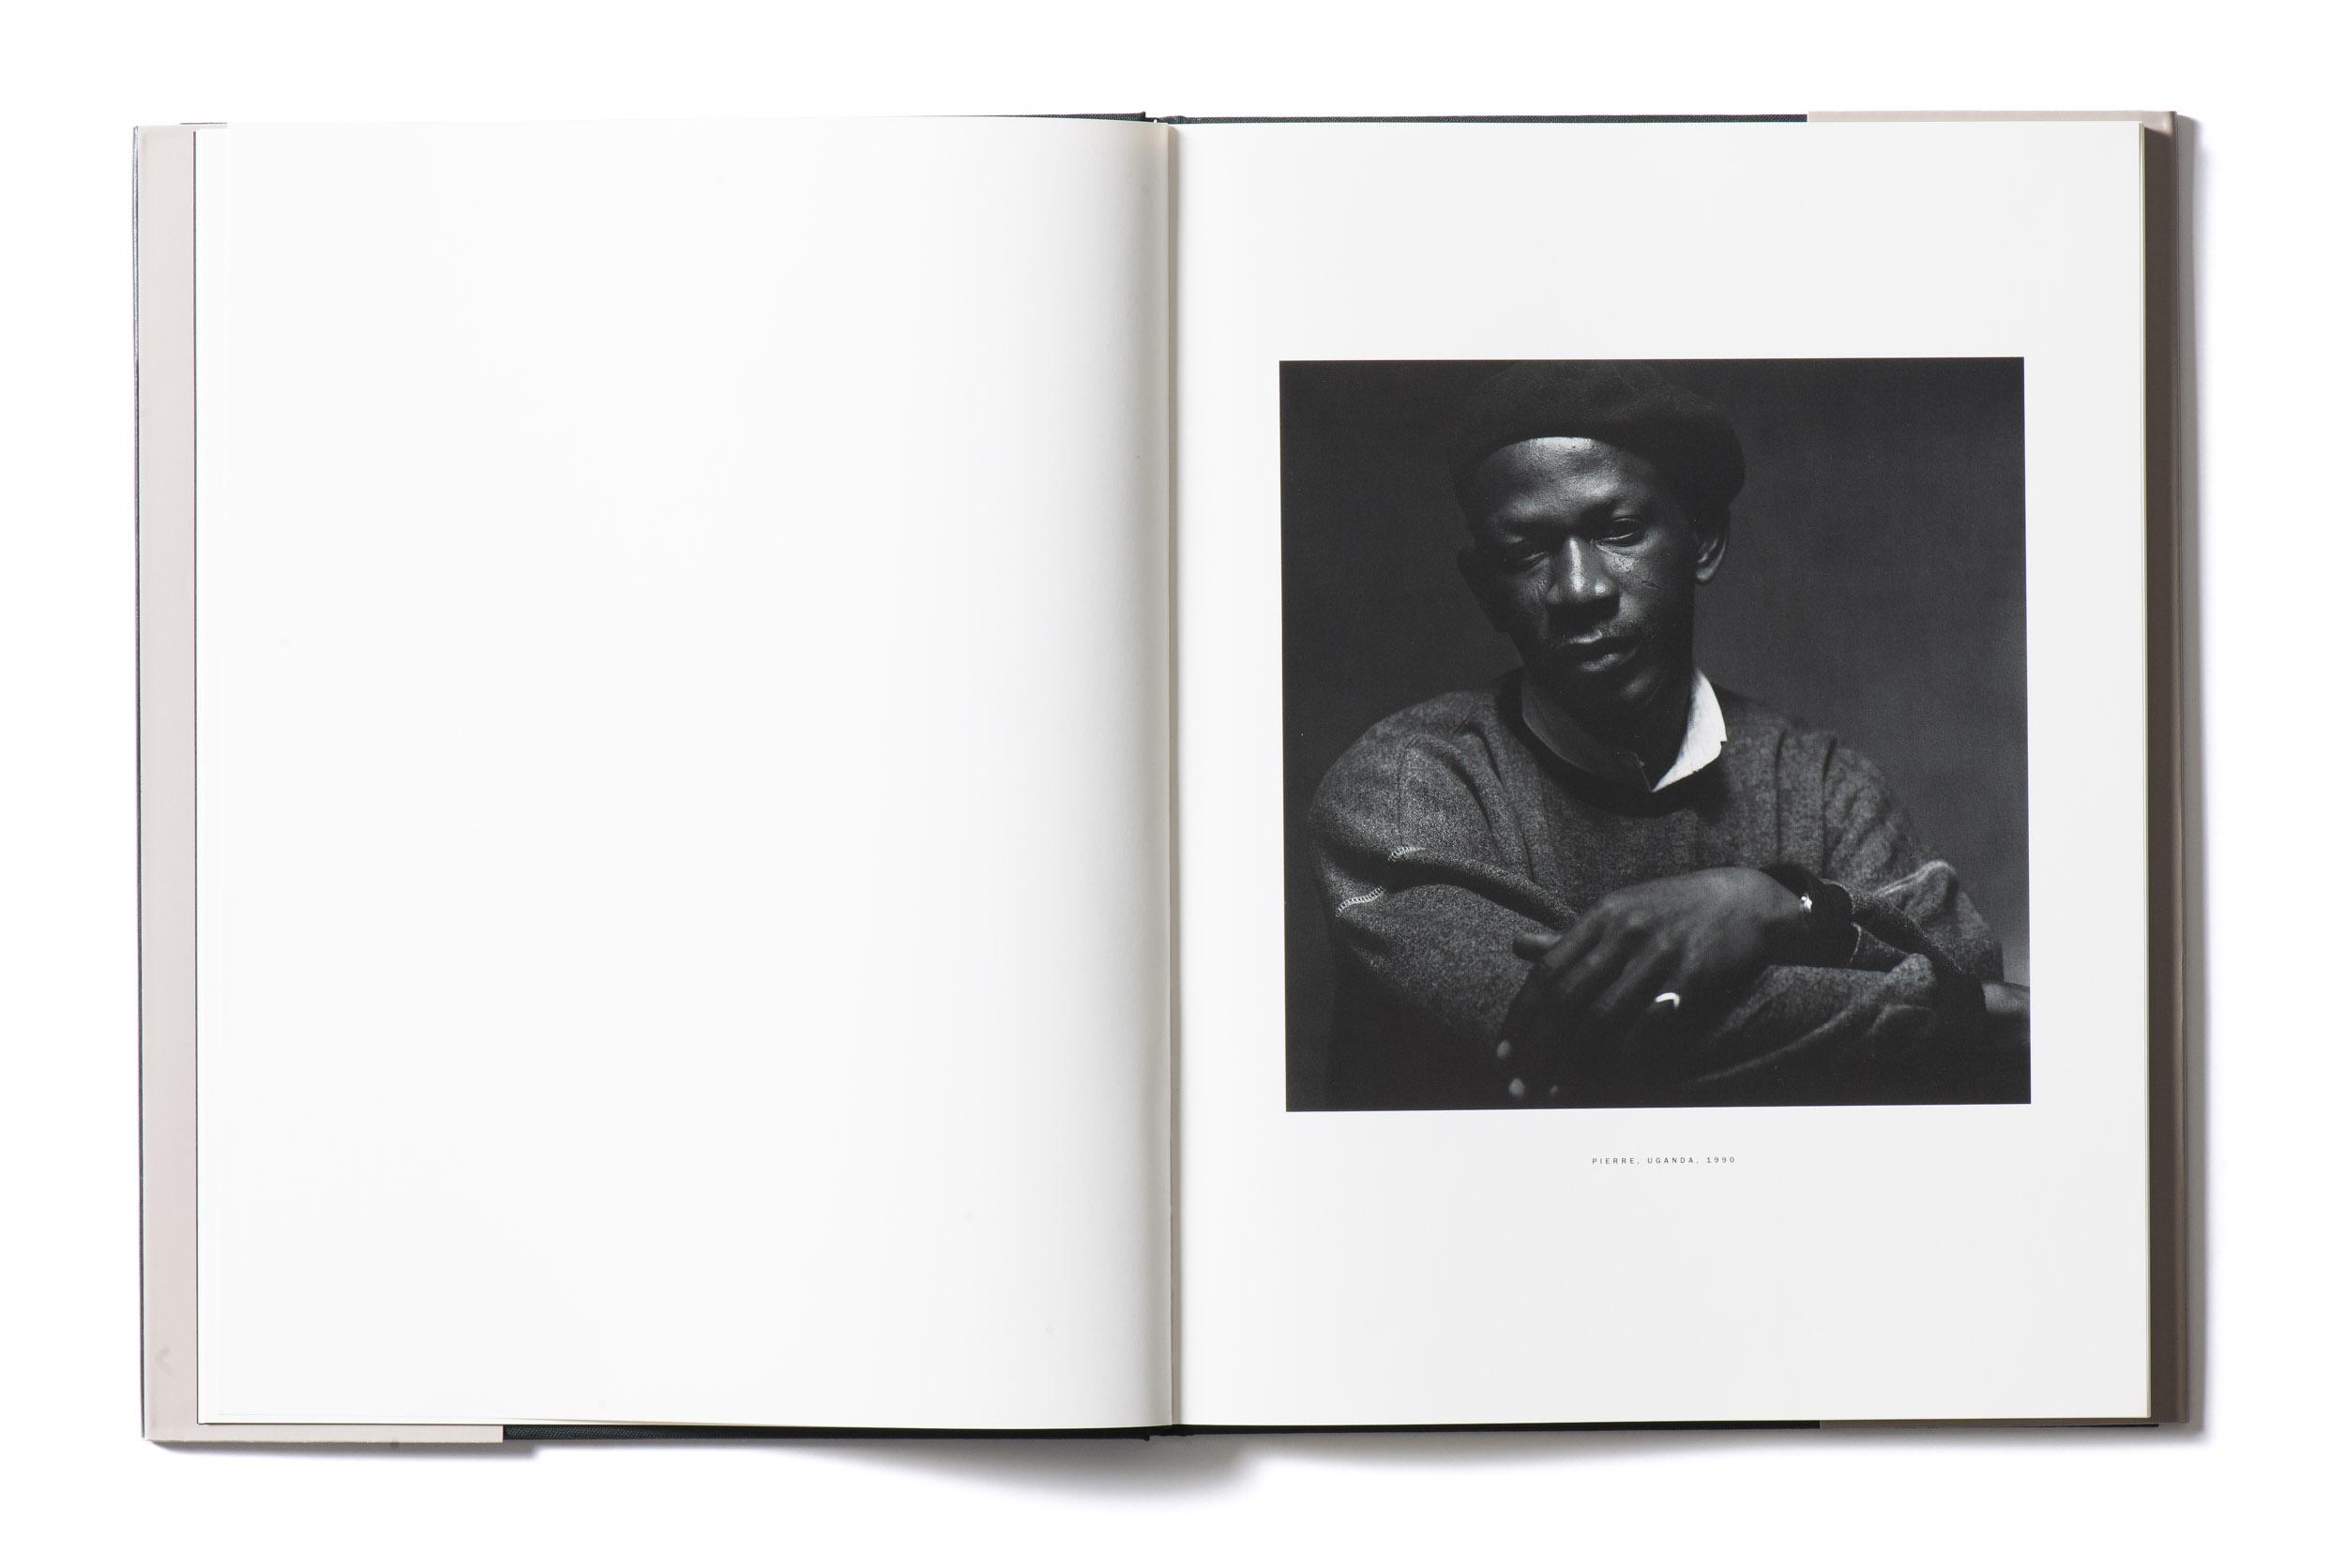 Kunstband Fotografien Peter Hebeisen Titel Feindbilder #1